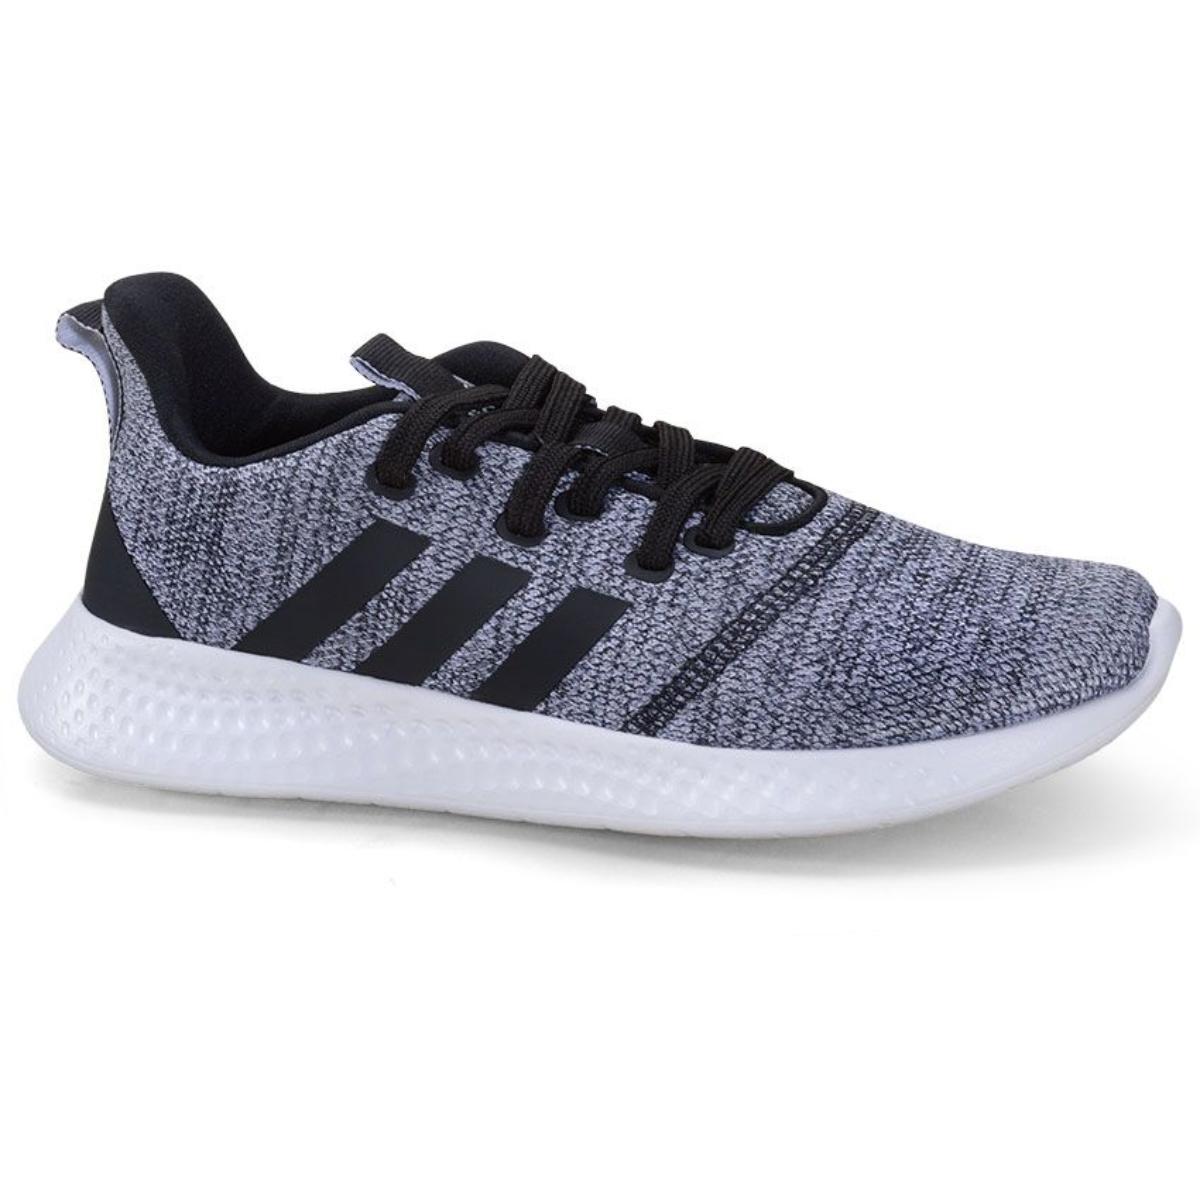 Tênis Feminino Adidas Fy8222 Puremotion Cinza/preto